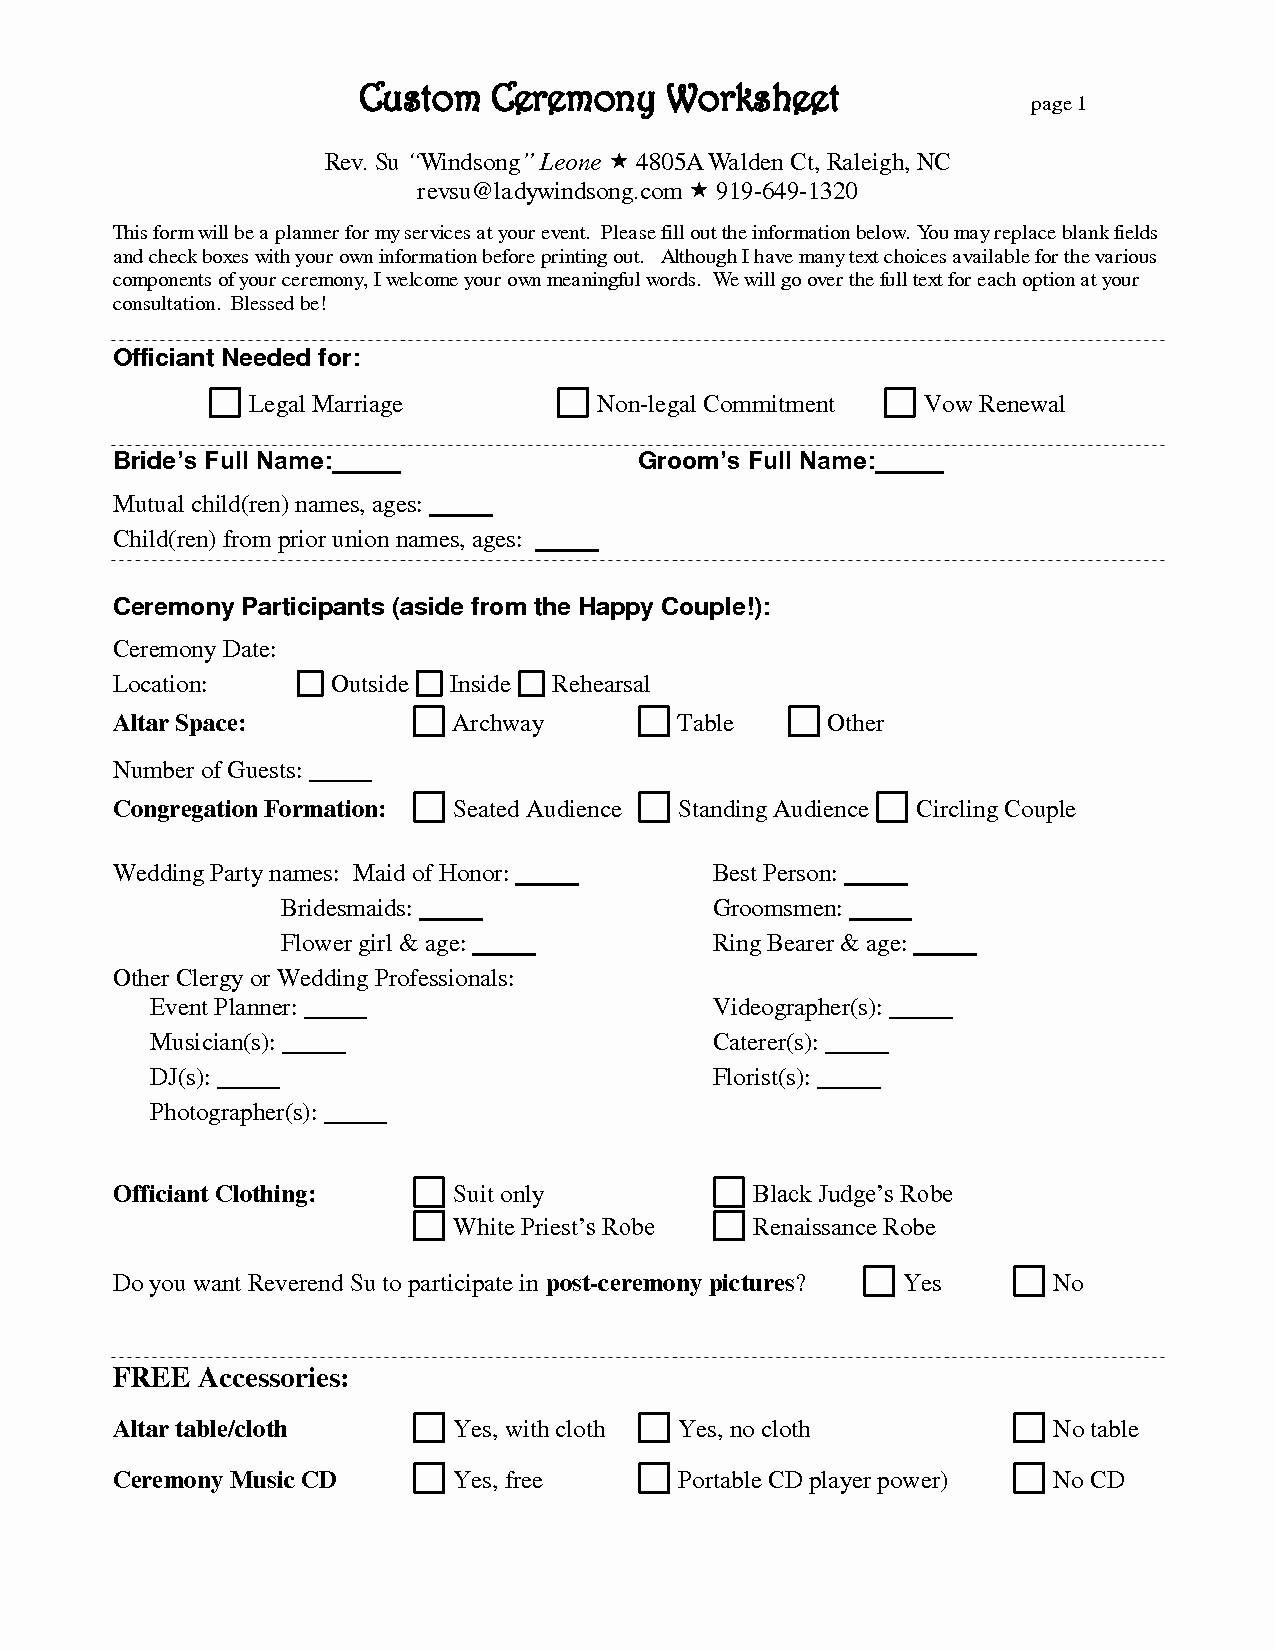 7 Best Of Printable Wedding Planner Contract